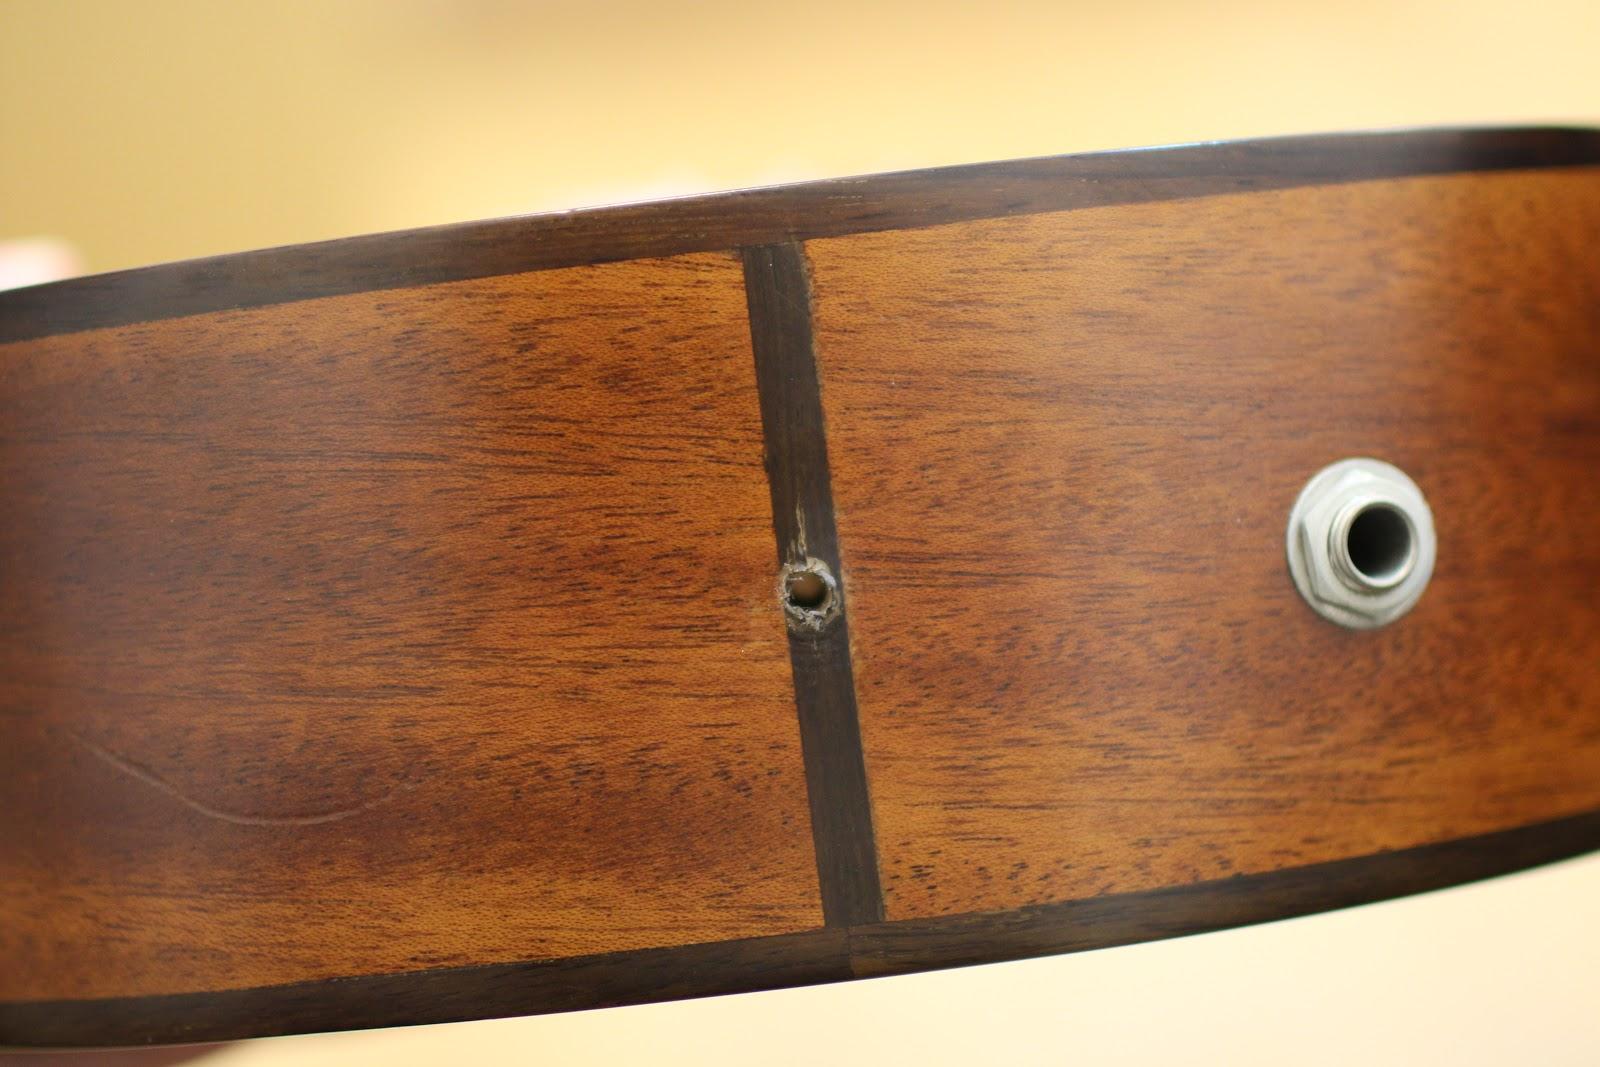 LOXX STRAP-LOCK 安全背帶扣 安裝